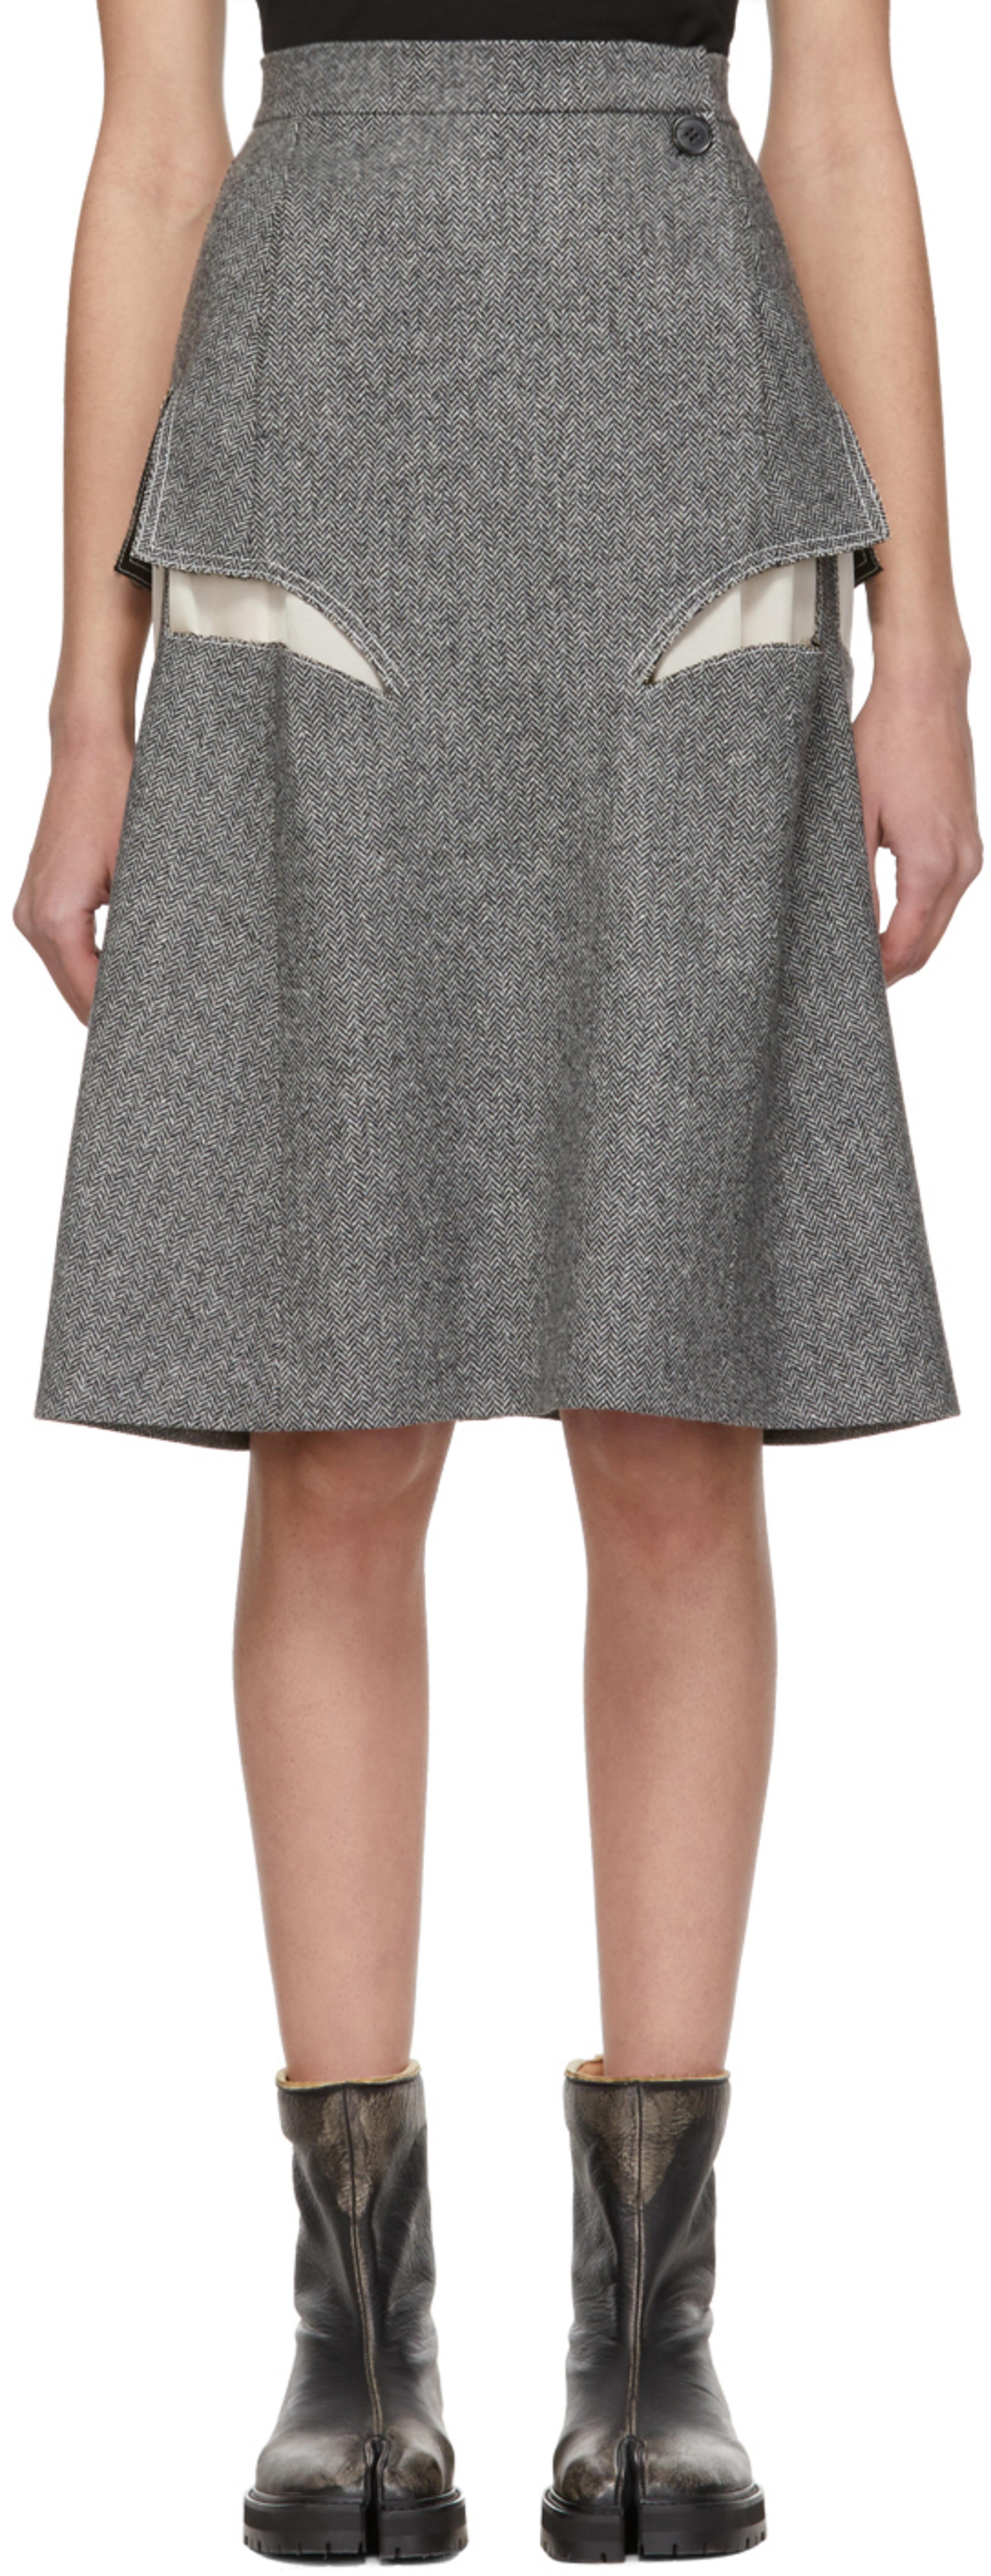 78ed6dcb9254 Designer Clothes